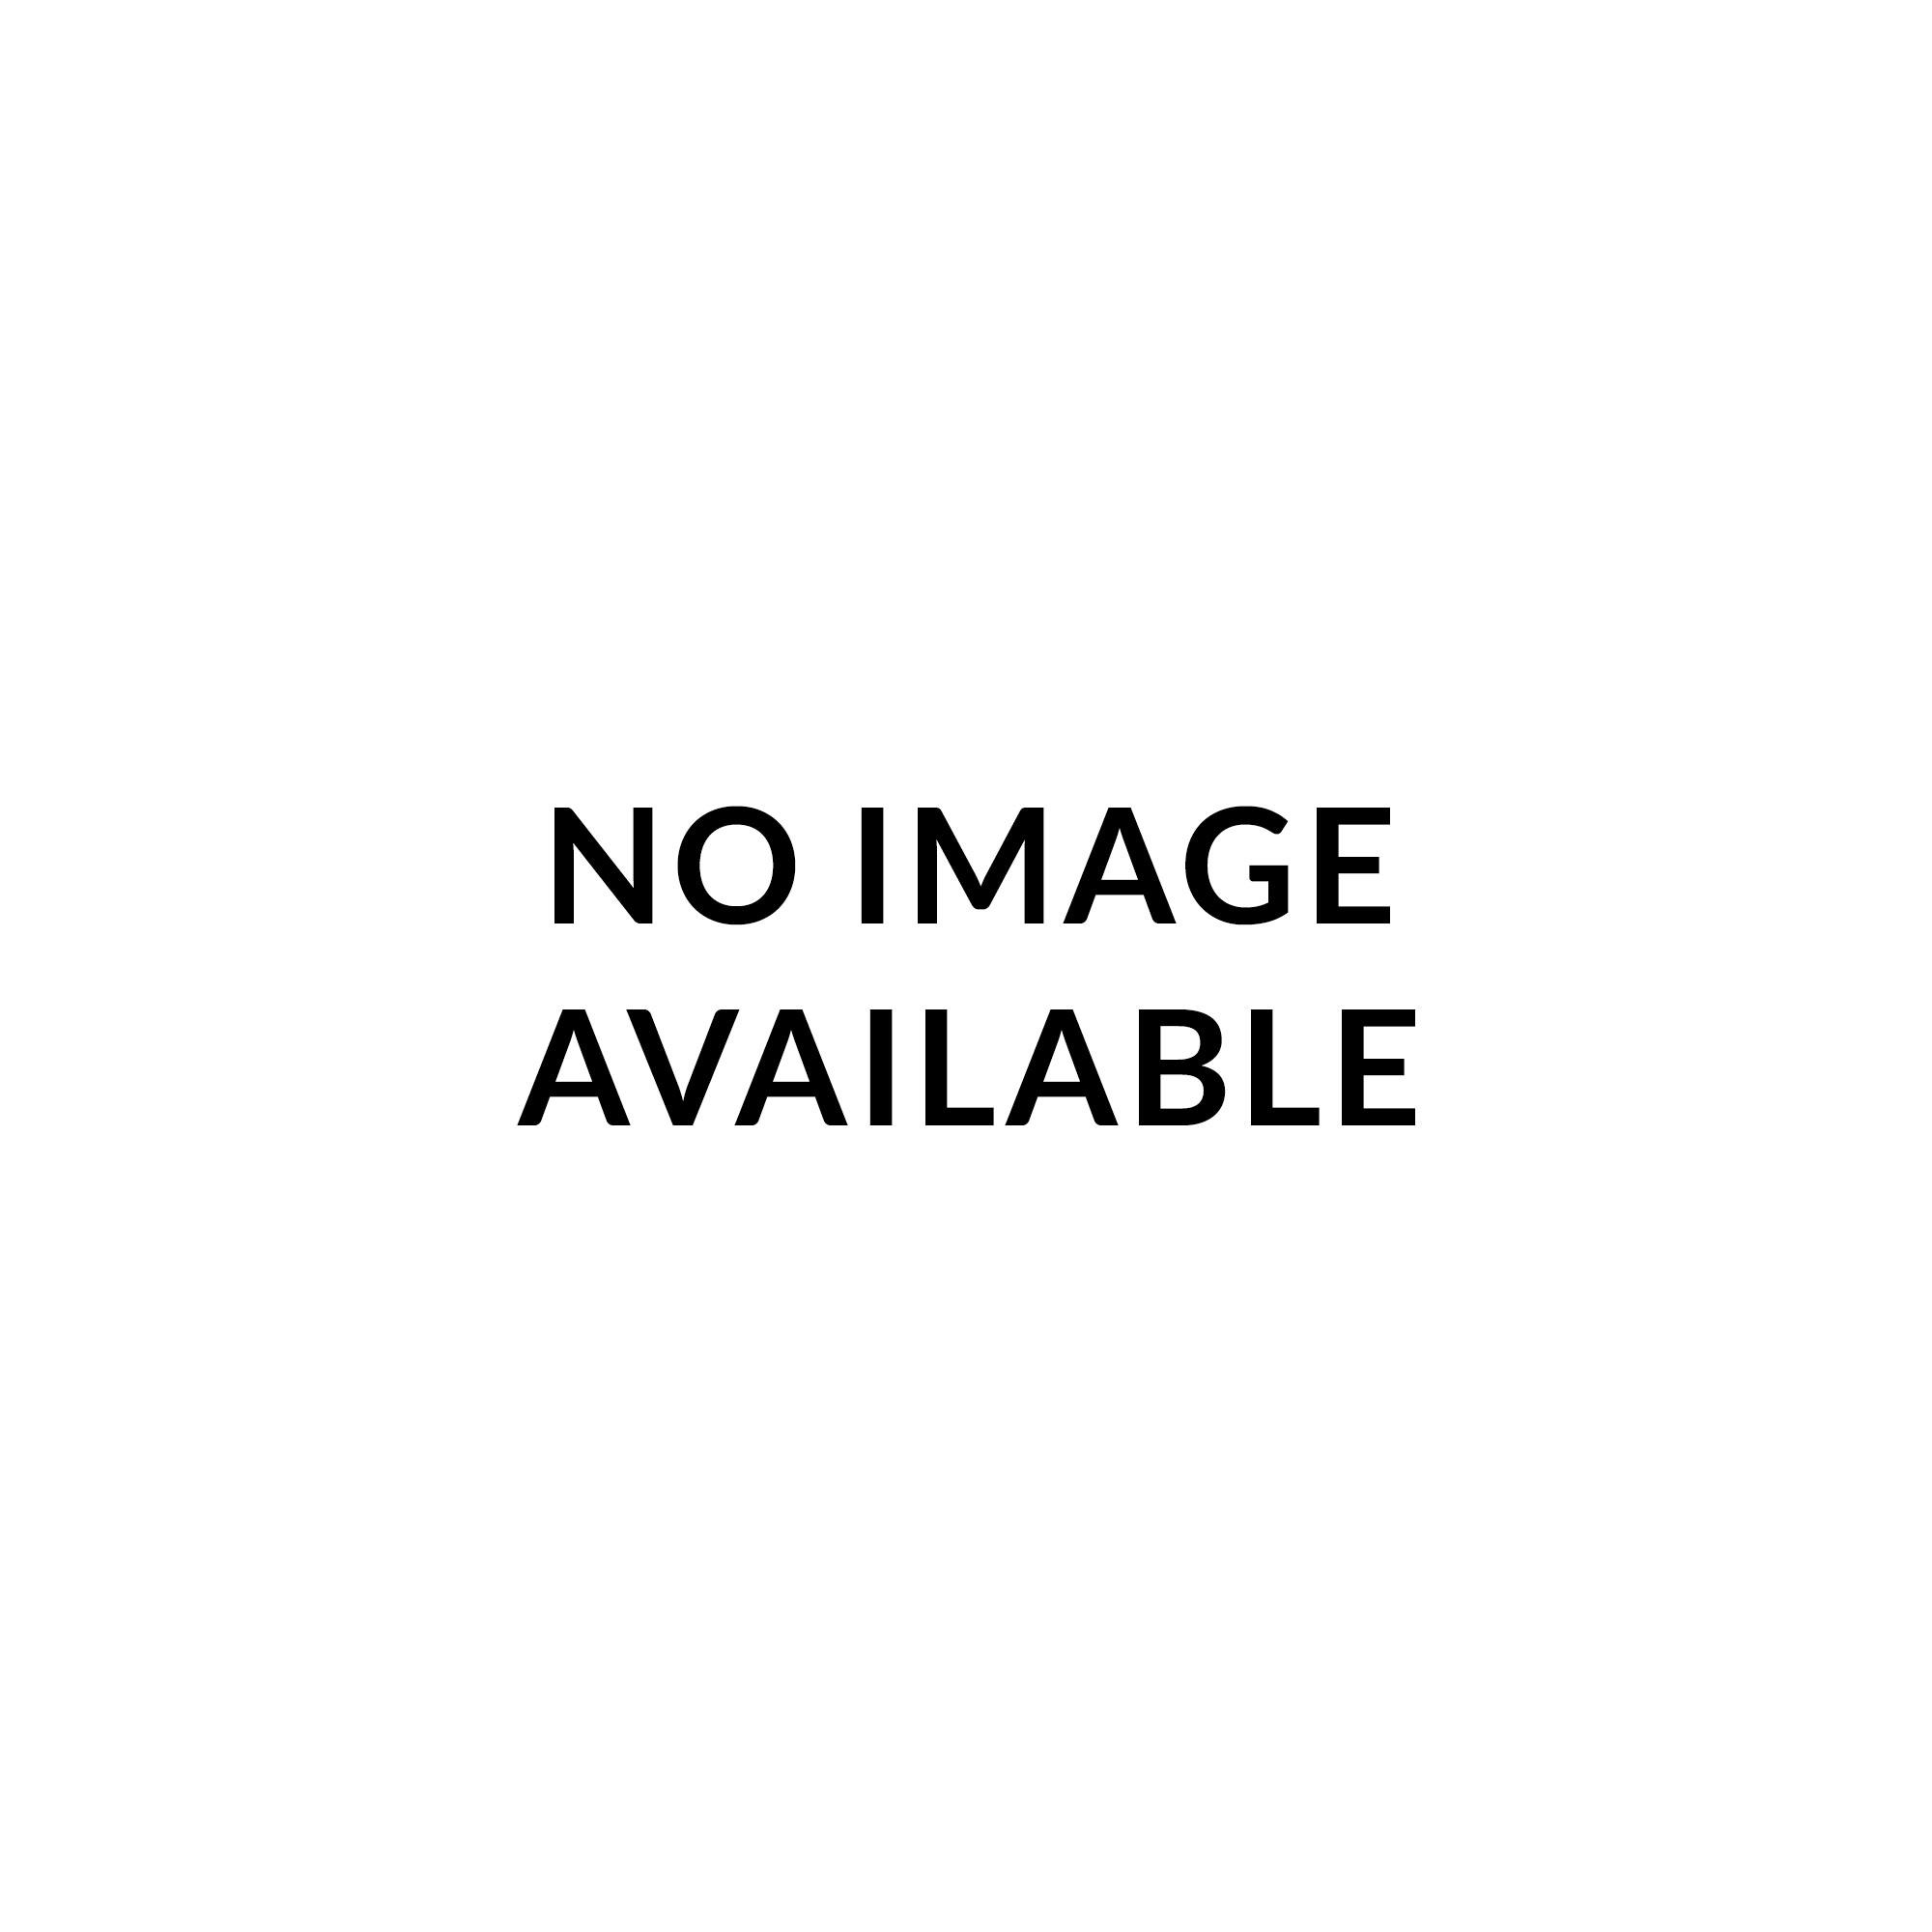 Gibson Masterbuilt Premium Phosphor Bronze Acoustic Guitar Strings 12-53